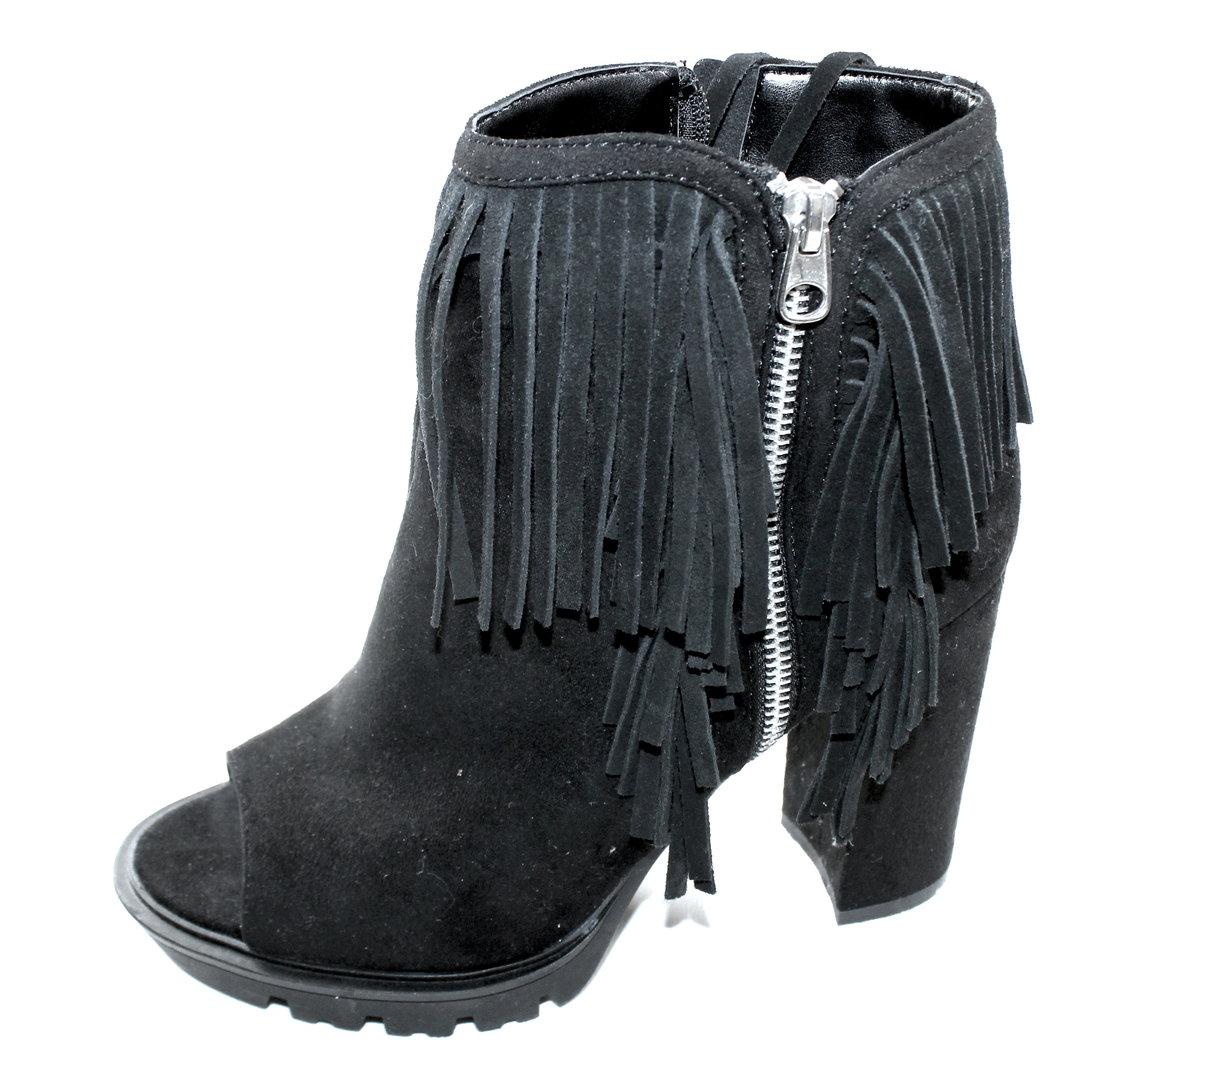 sports shoes f4190 8b18e CATWALK Fransen Boots Stiefeletten Peeptoes